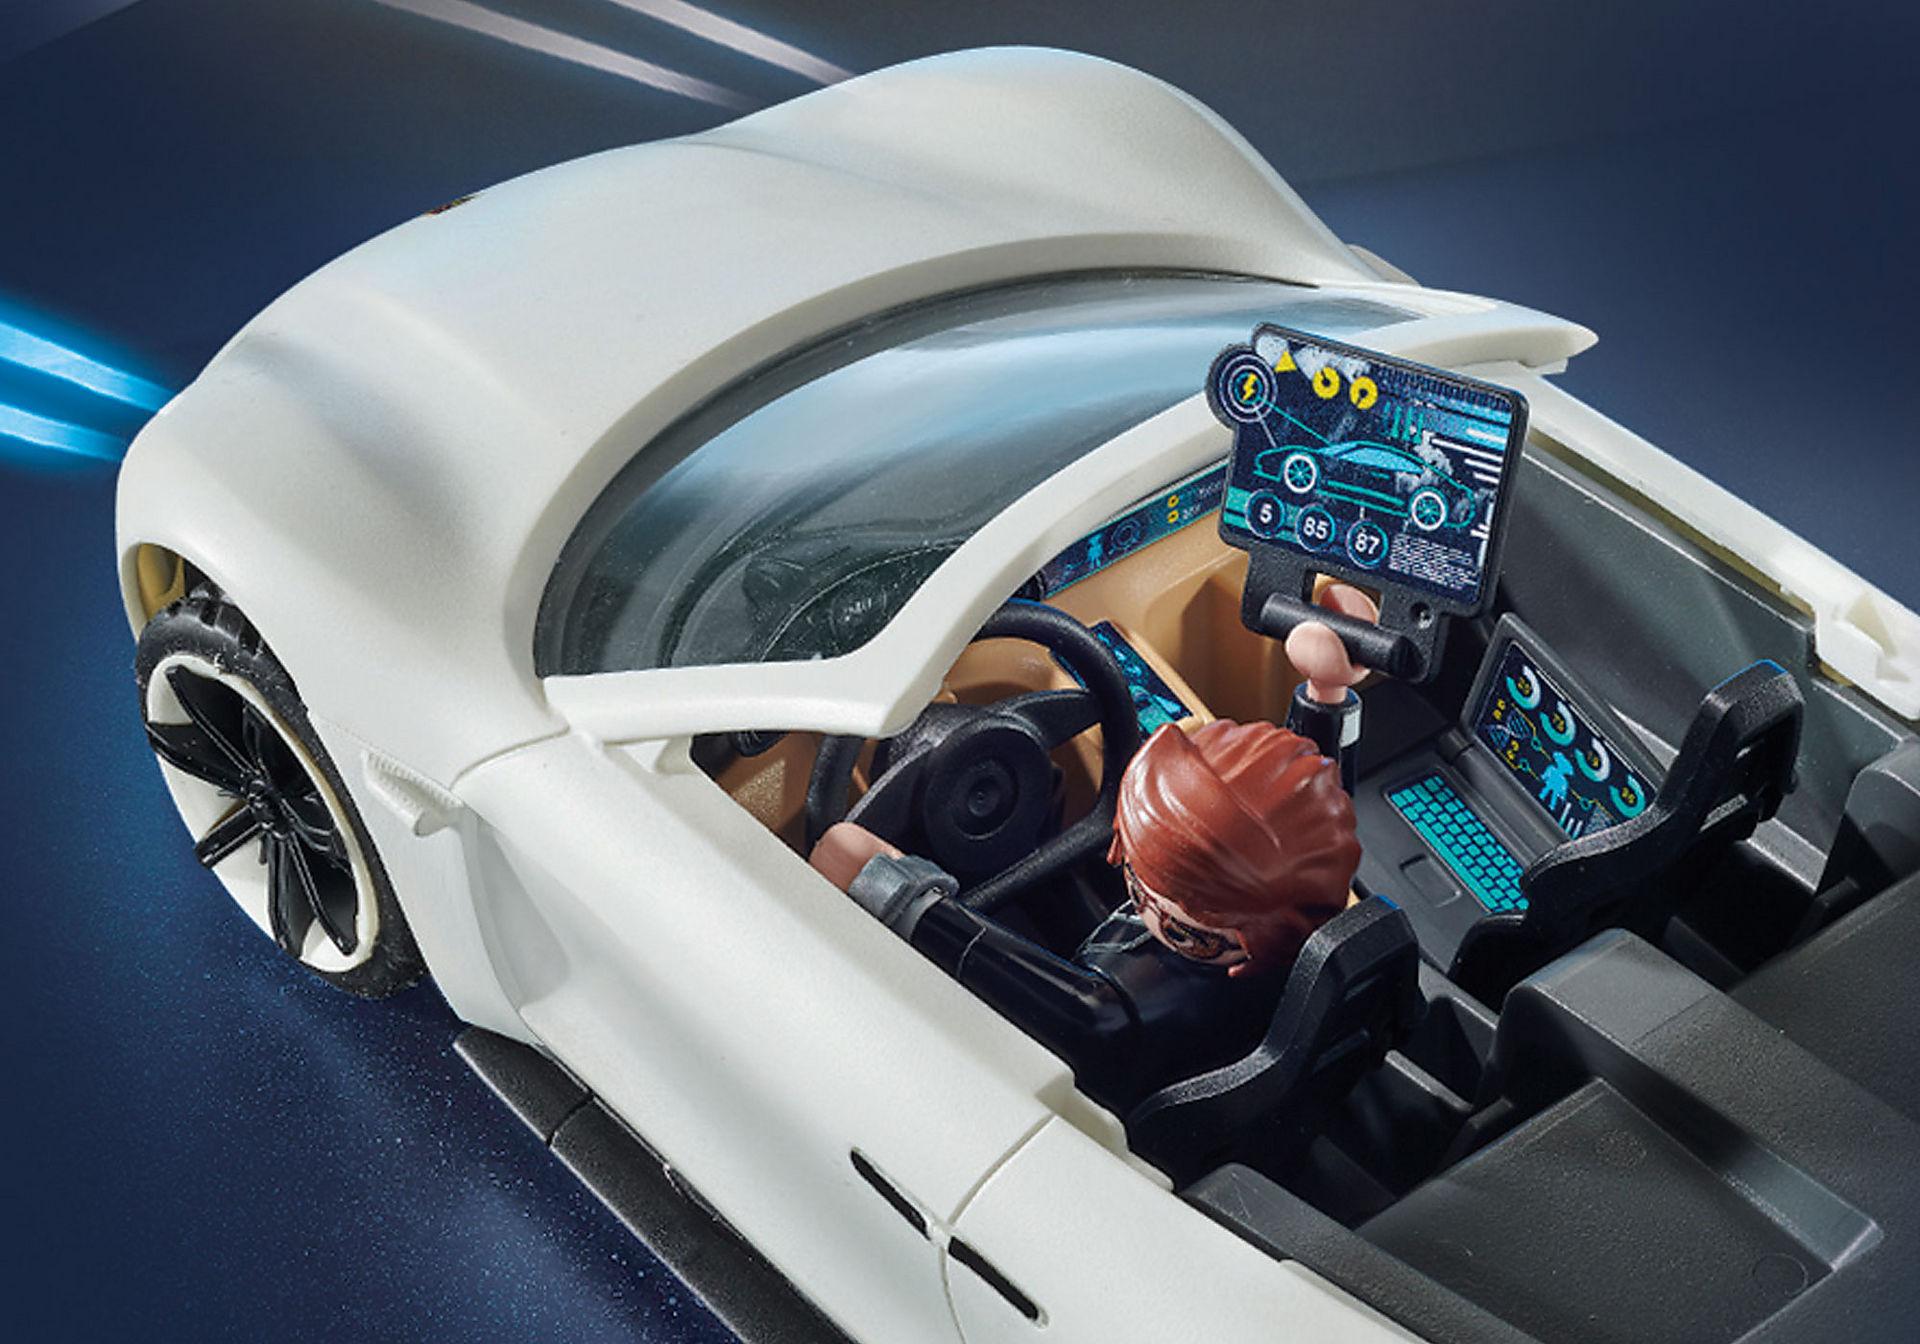 70078 PLAYMOBIL: THE MOVIE Ο Ρεξ Ντάσερ με την Porsche Mission E zoom image7